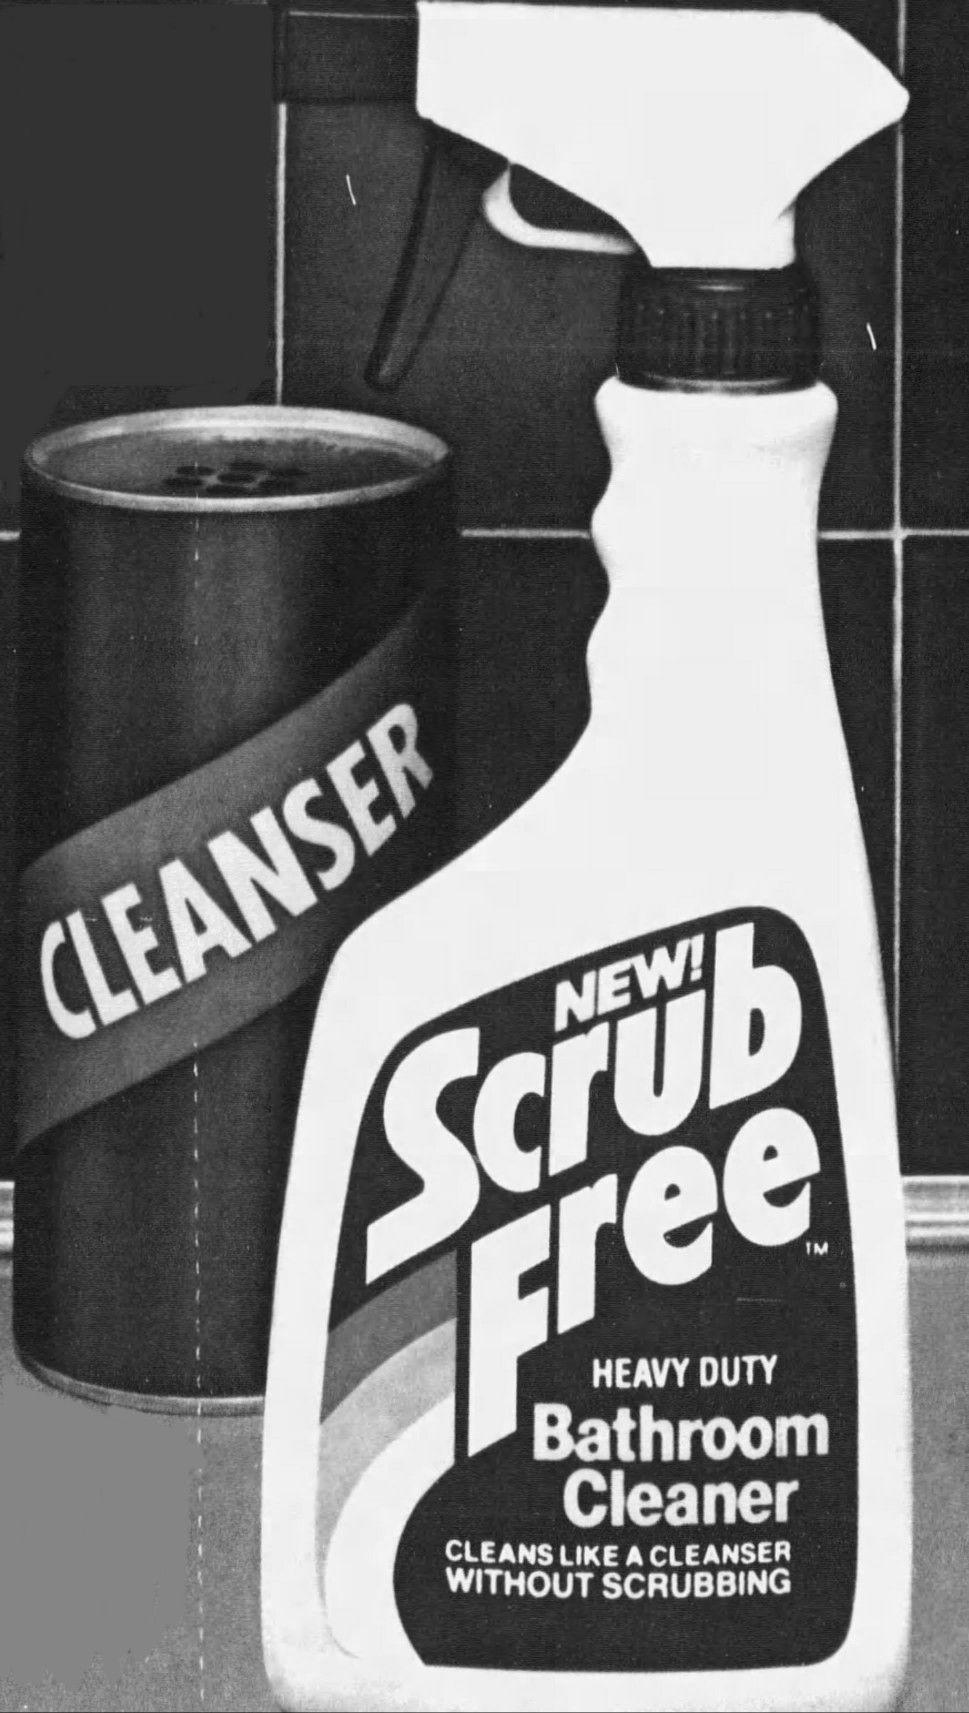 Scrub Free Bathroom Cleaner Ecolab 1984 Kitchen Cleaner Vintage Laundry Bathroom Cleaner